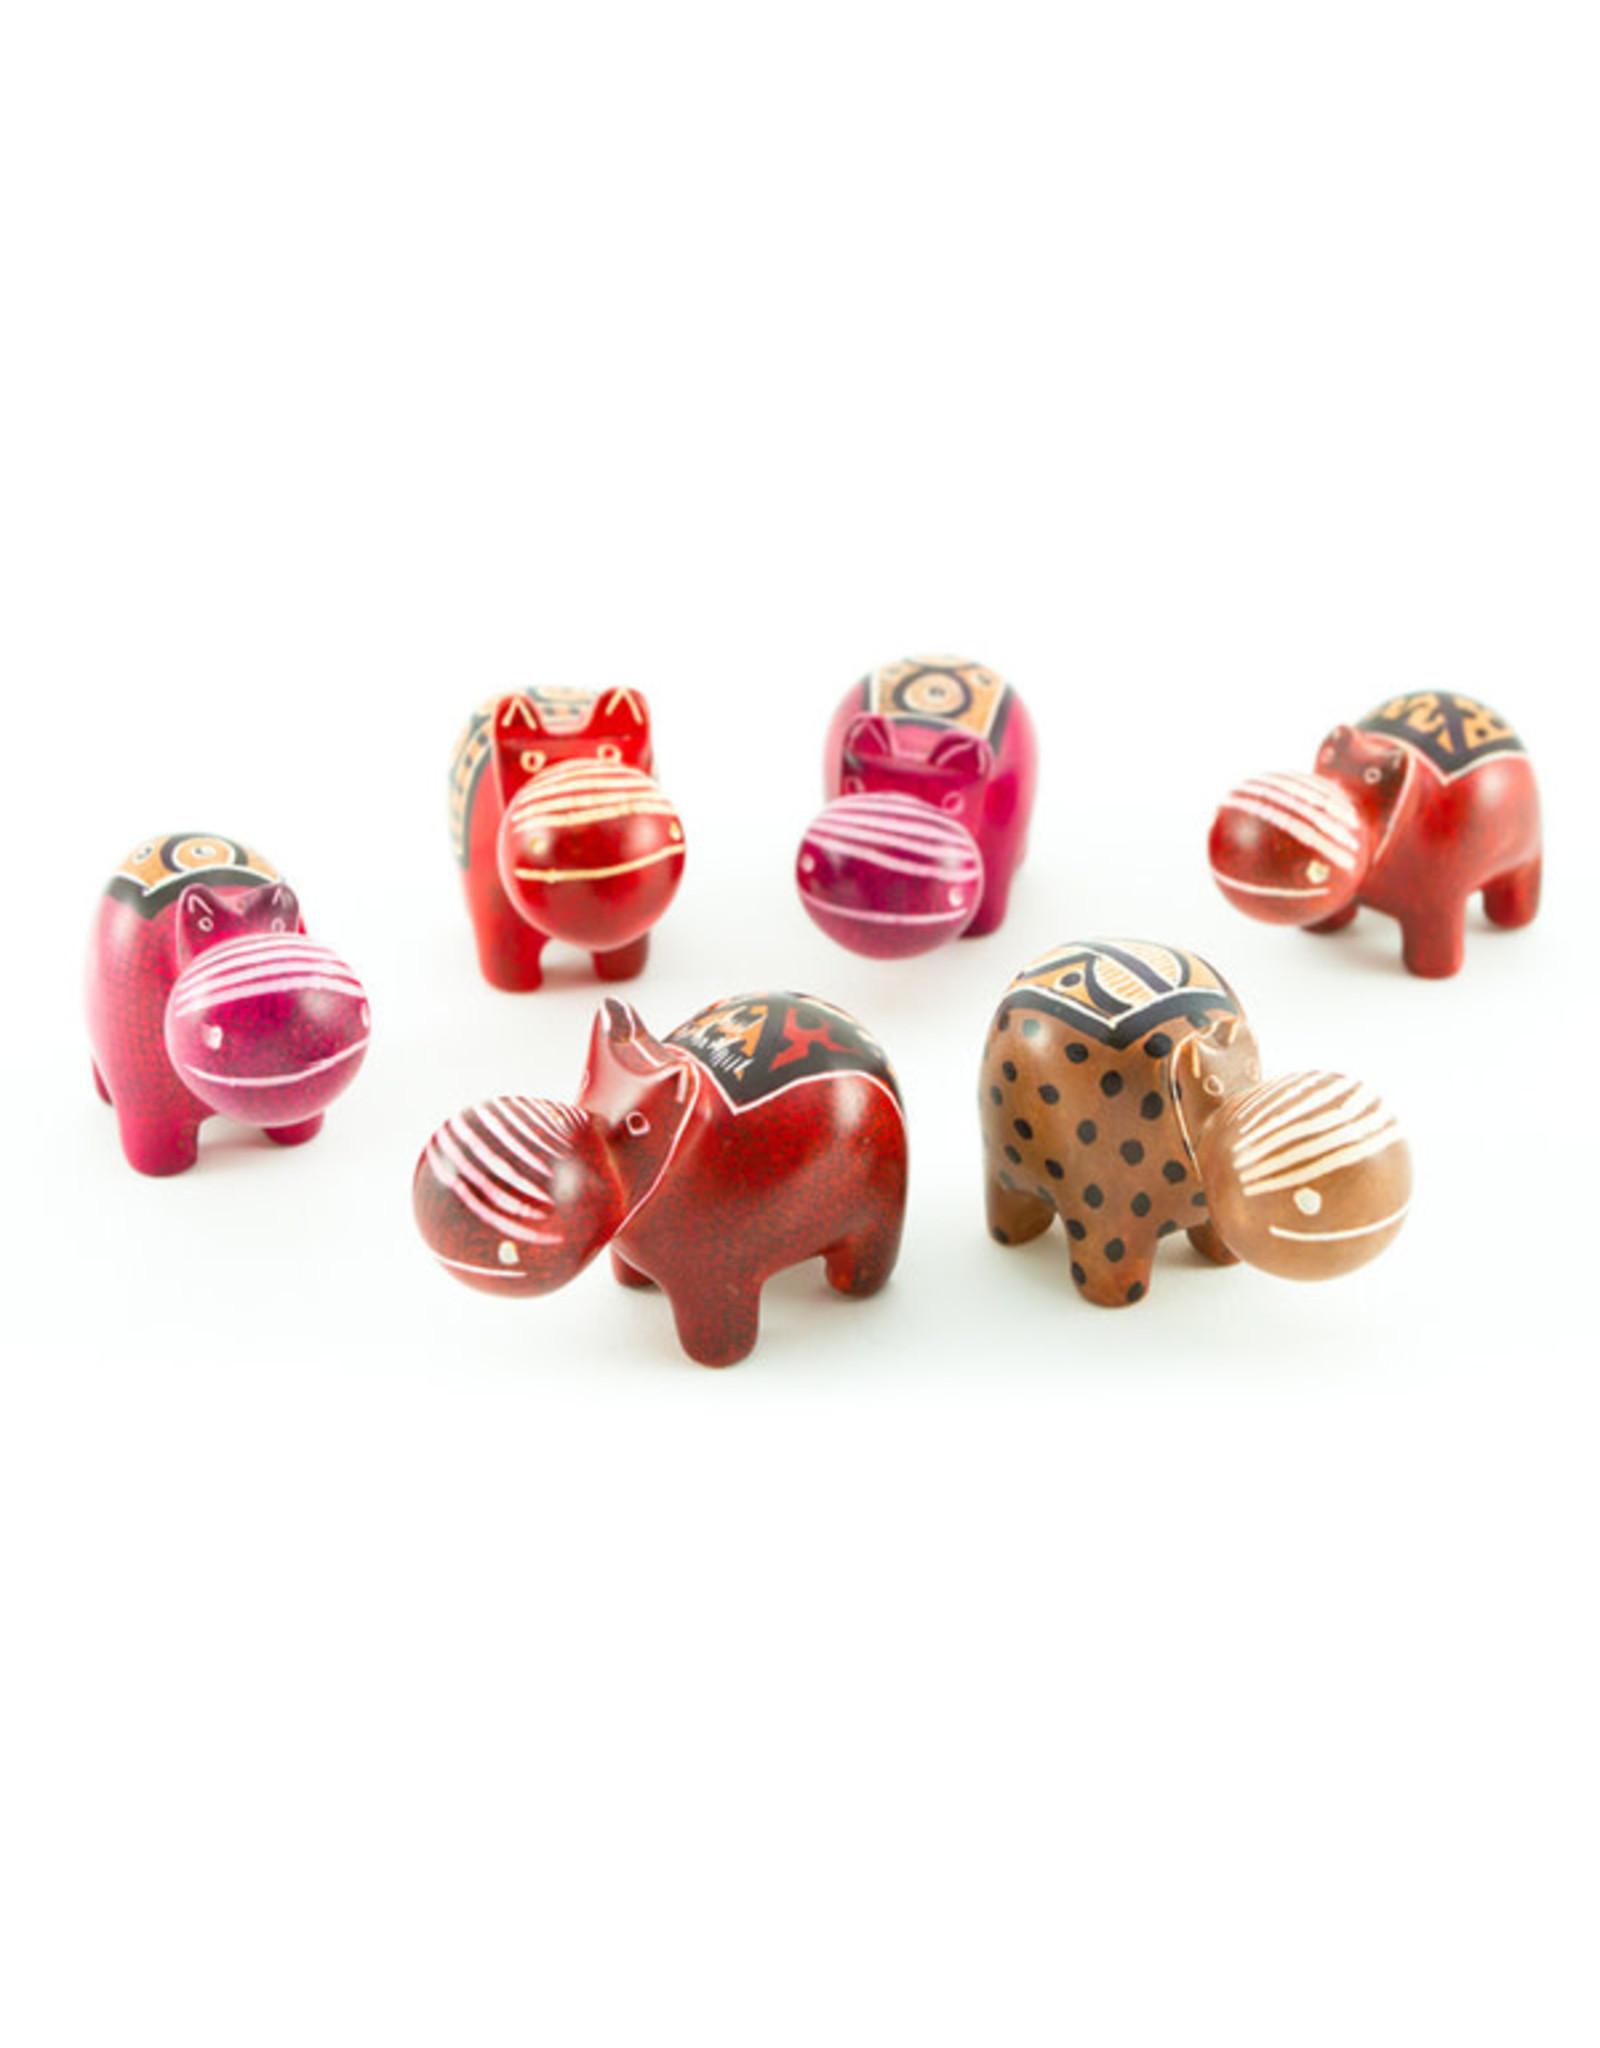 Swahili Wholesale Miniature Soapstone Hippos, Kenya.